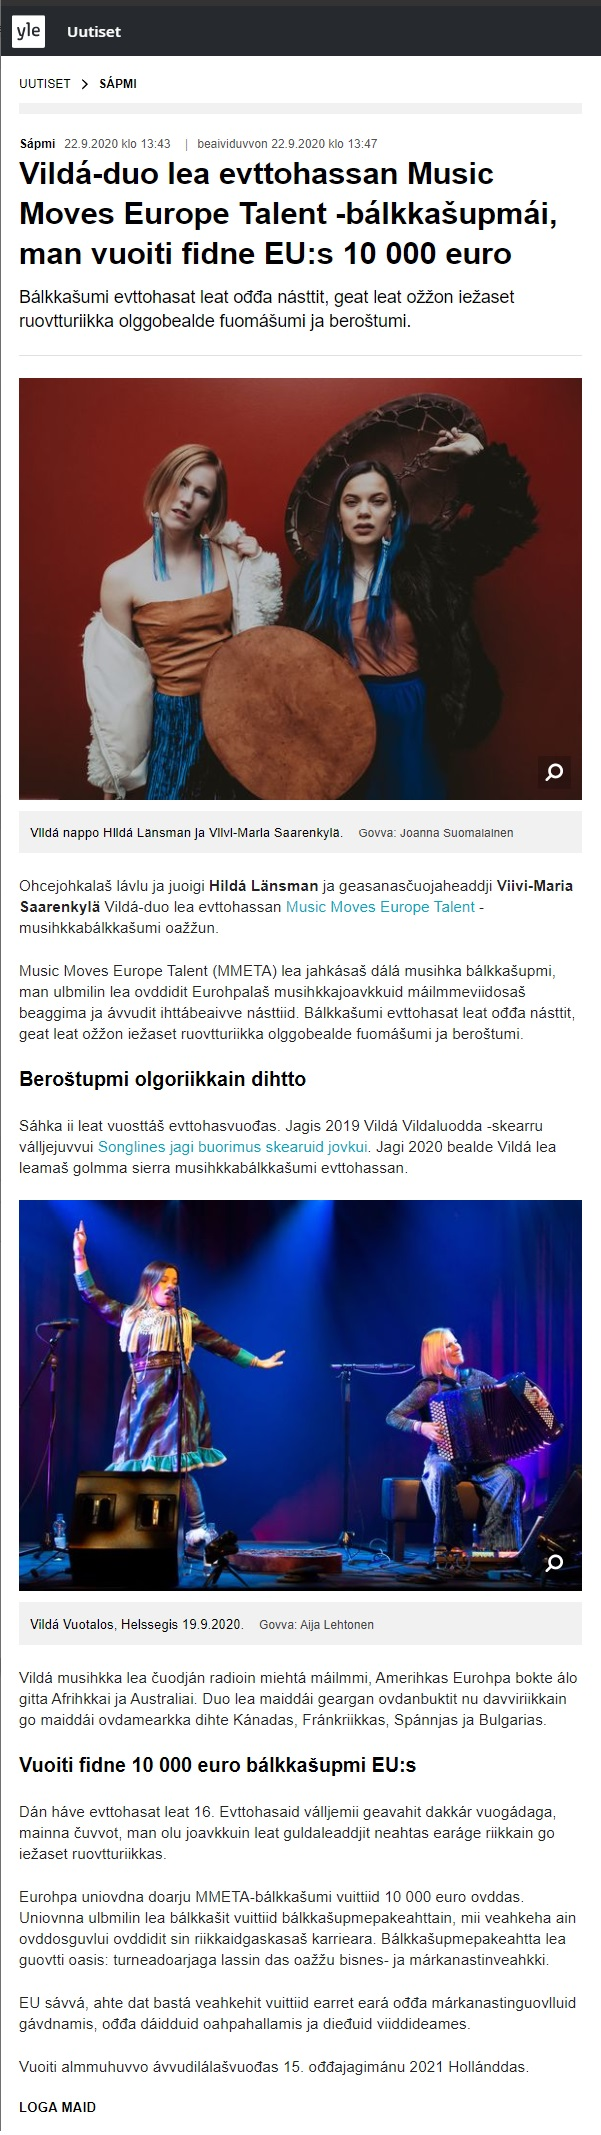 Yle Sápmi (Finland), 22.9.2020